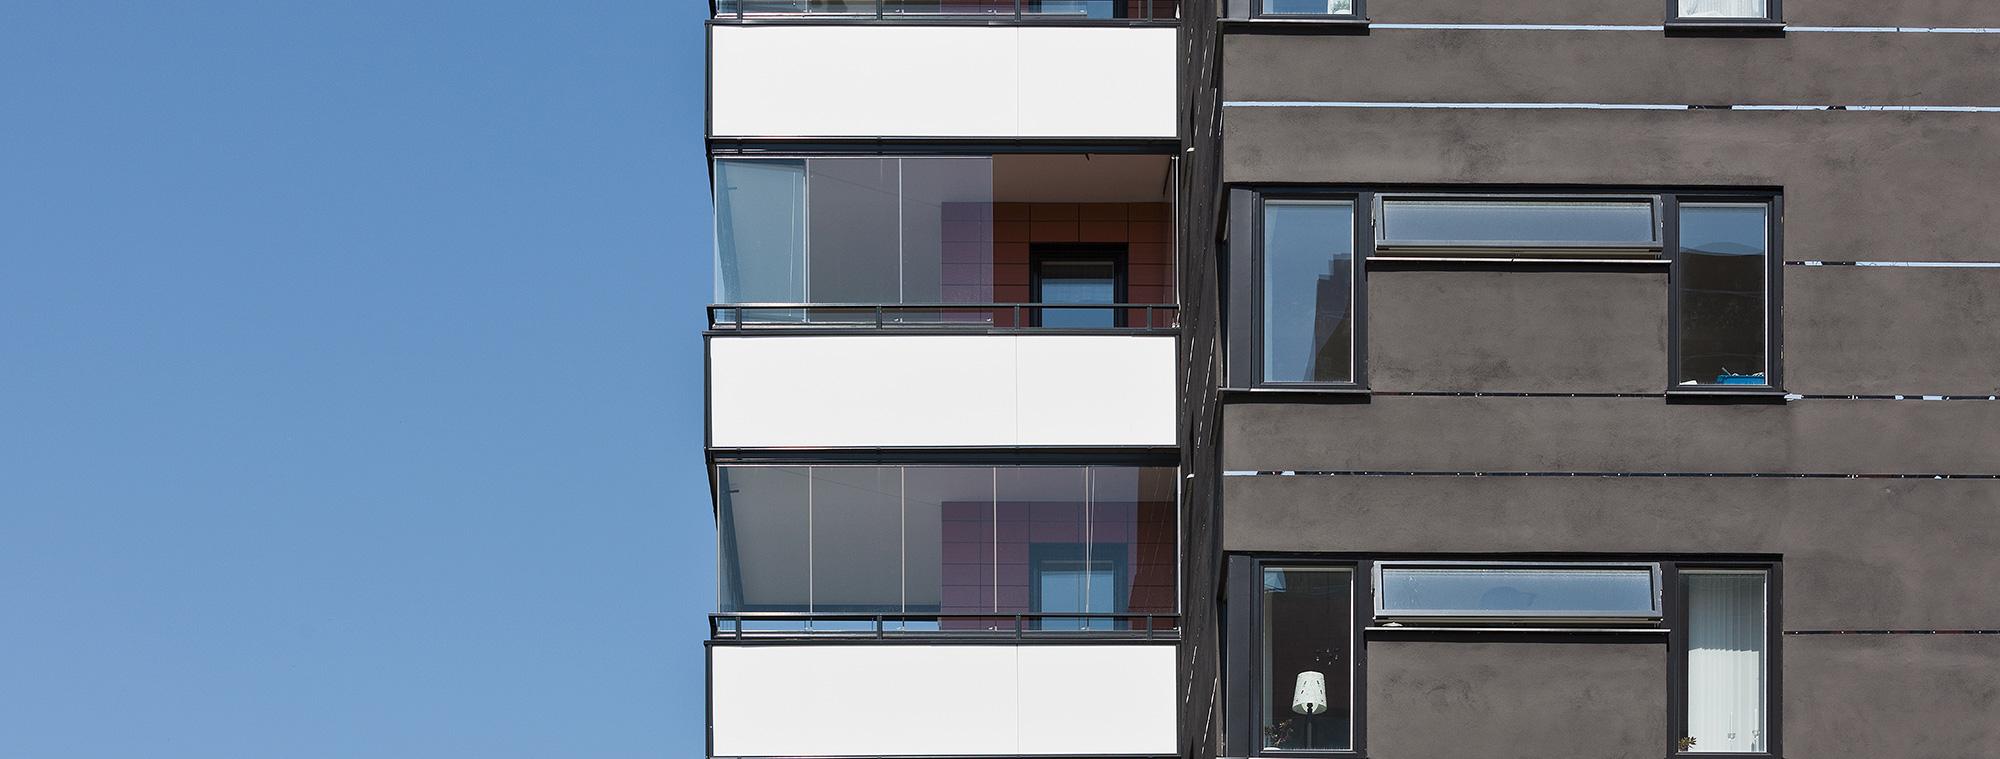 glasa in balkong rotavdrag